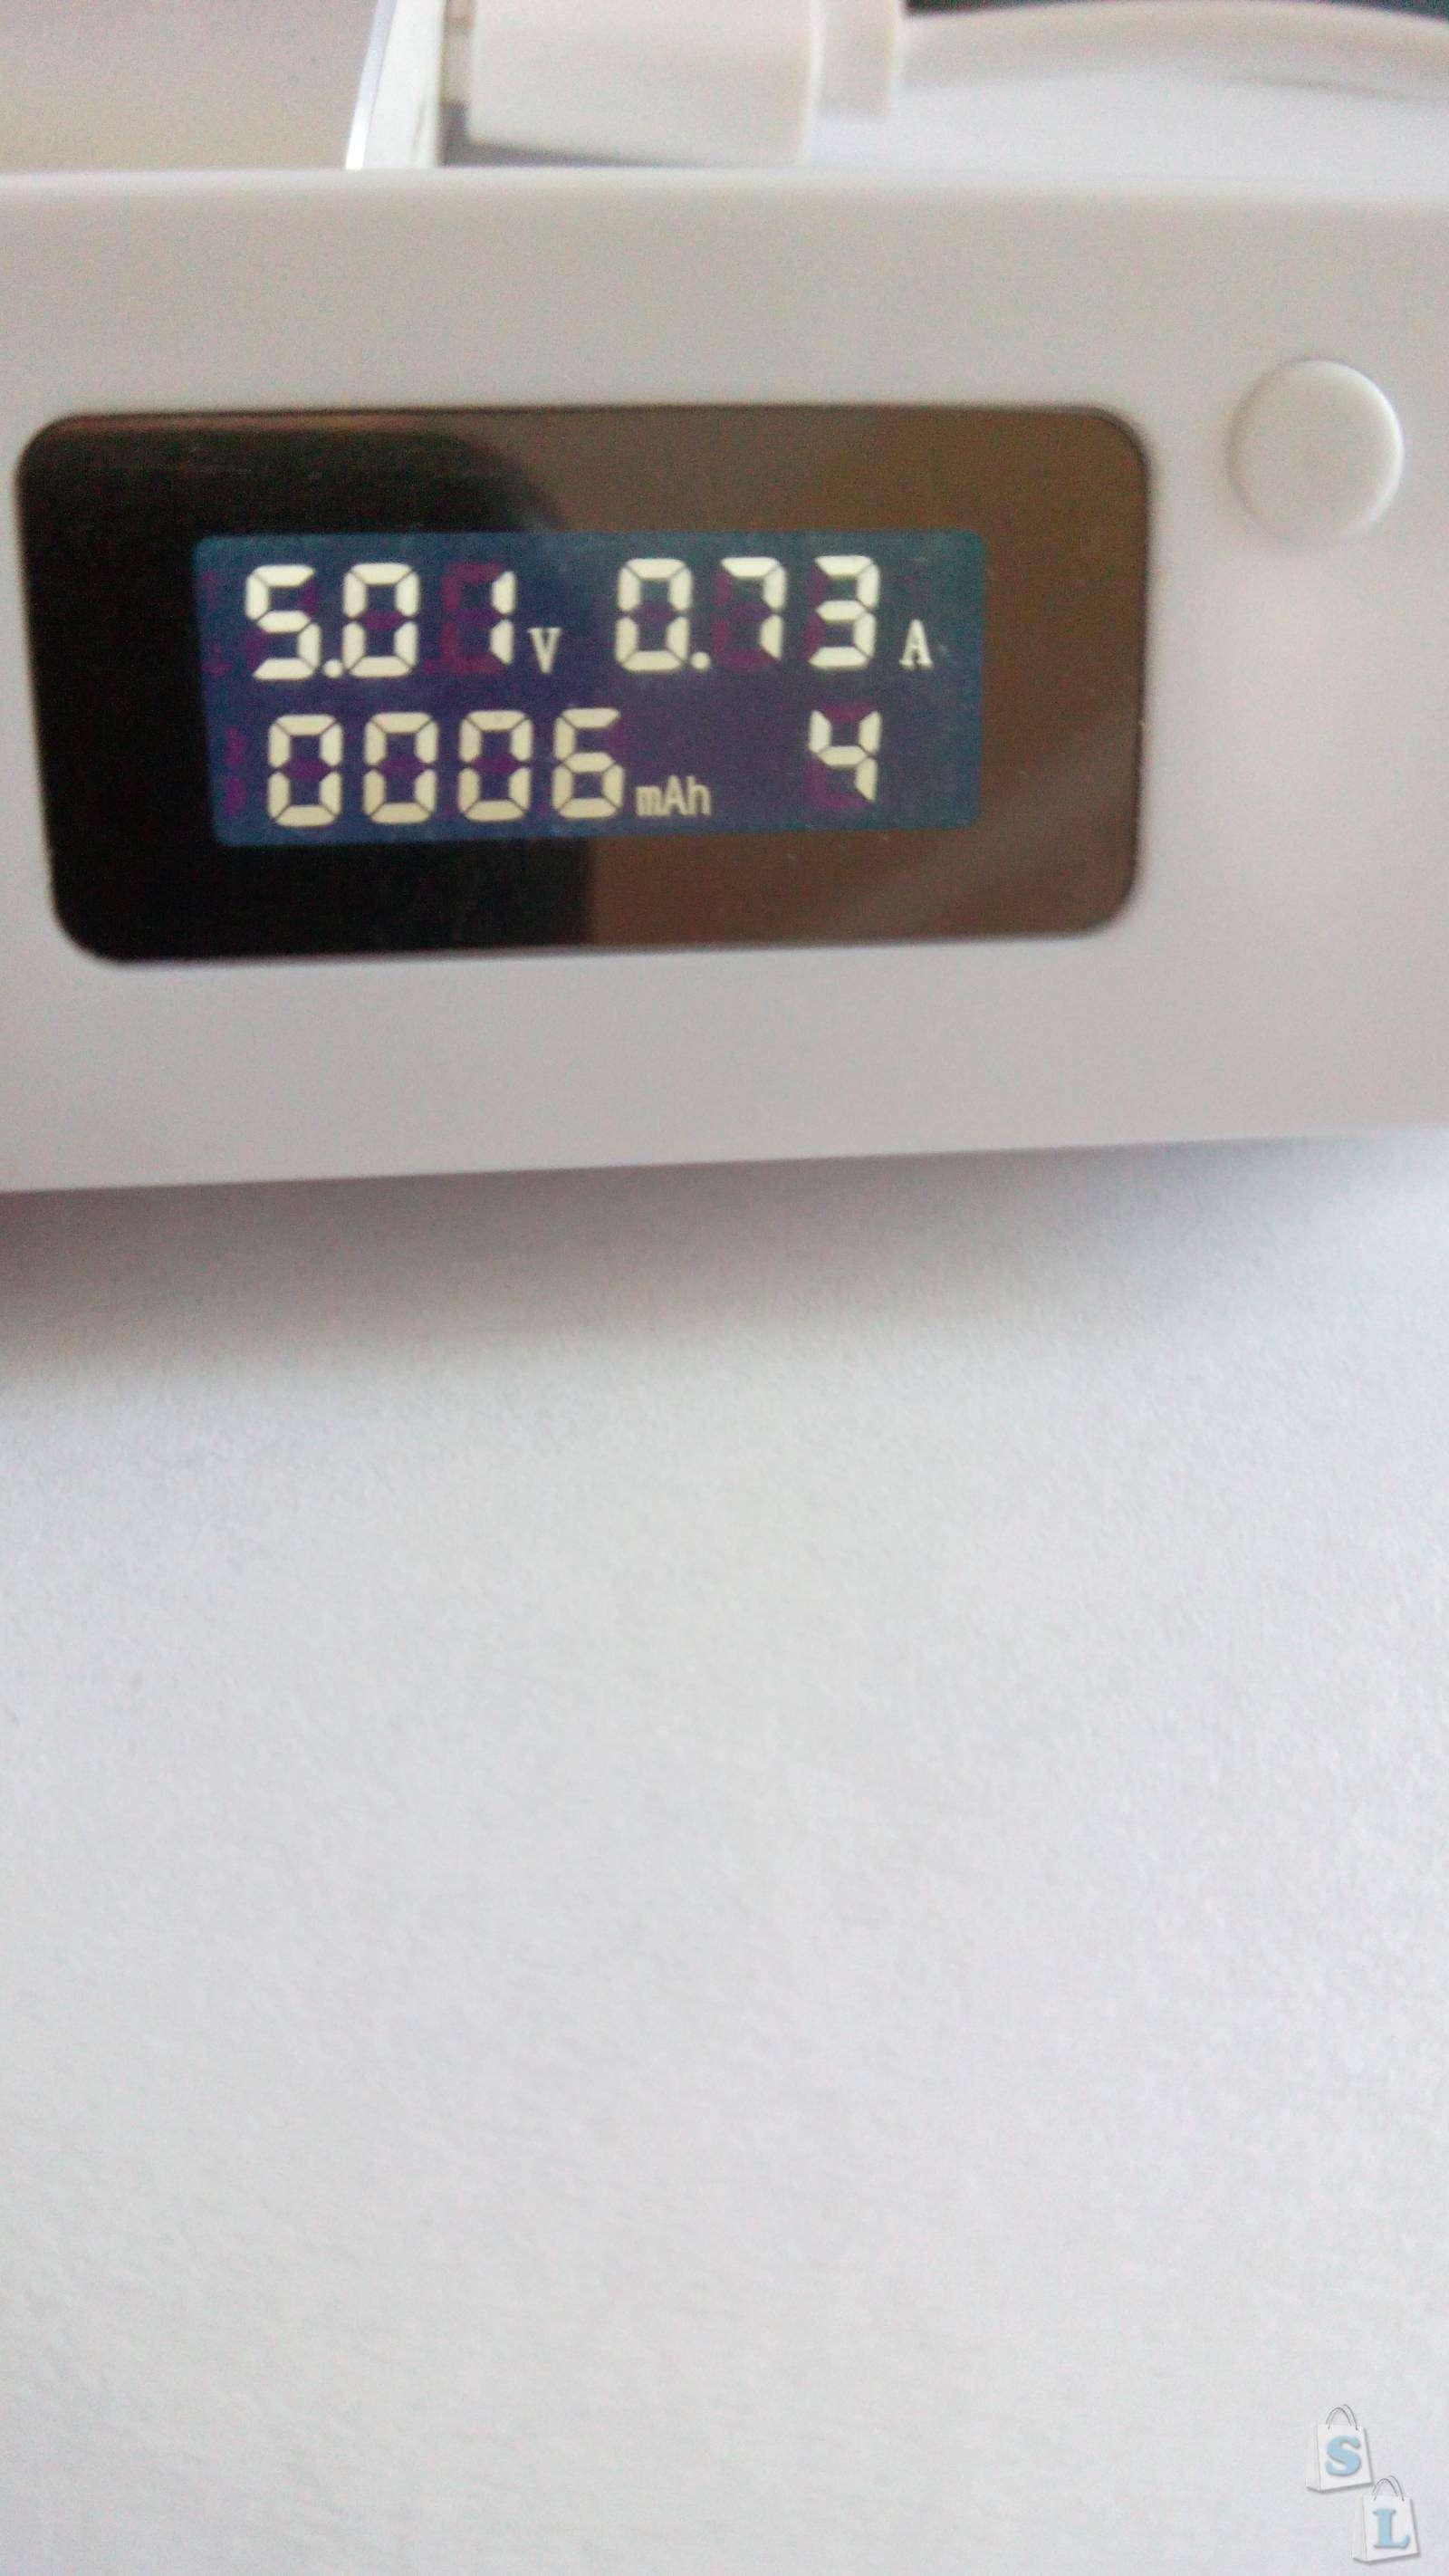 Shopper: Отчет о получении приза - powerbank Xiaomi 16000 mAh